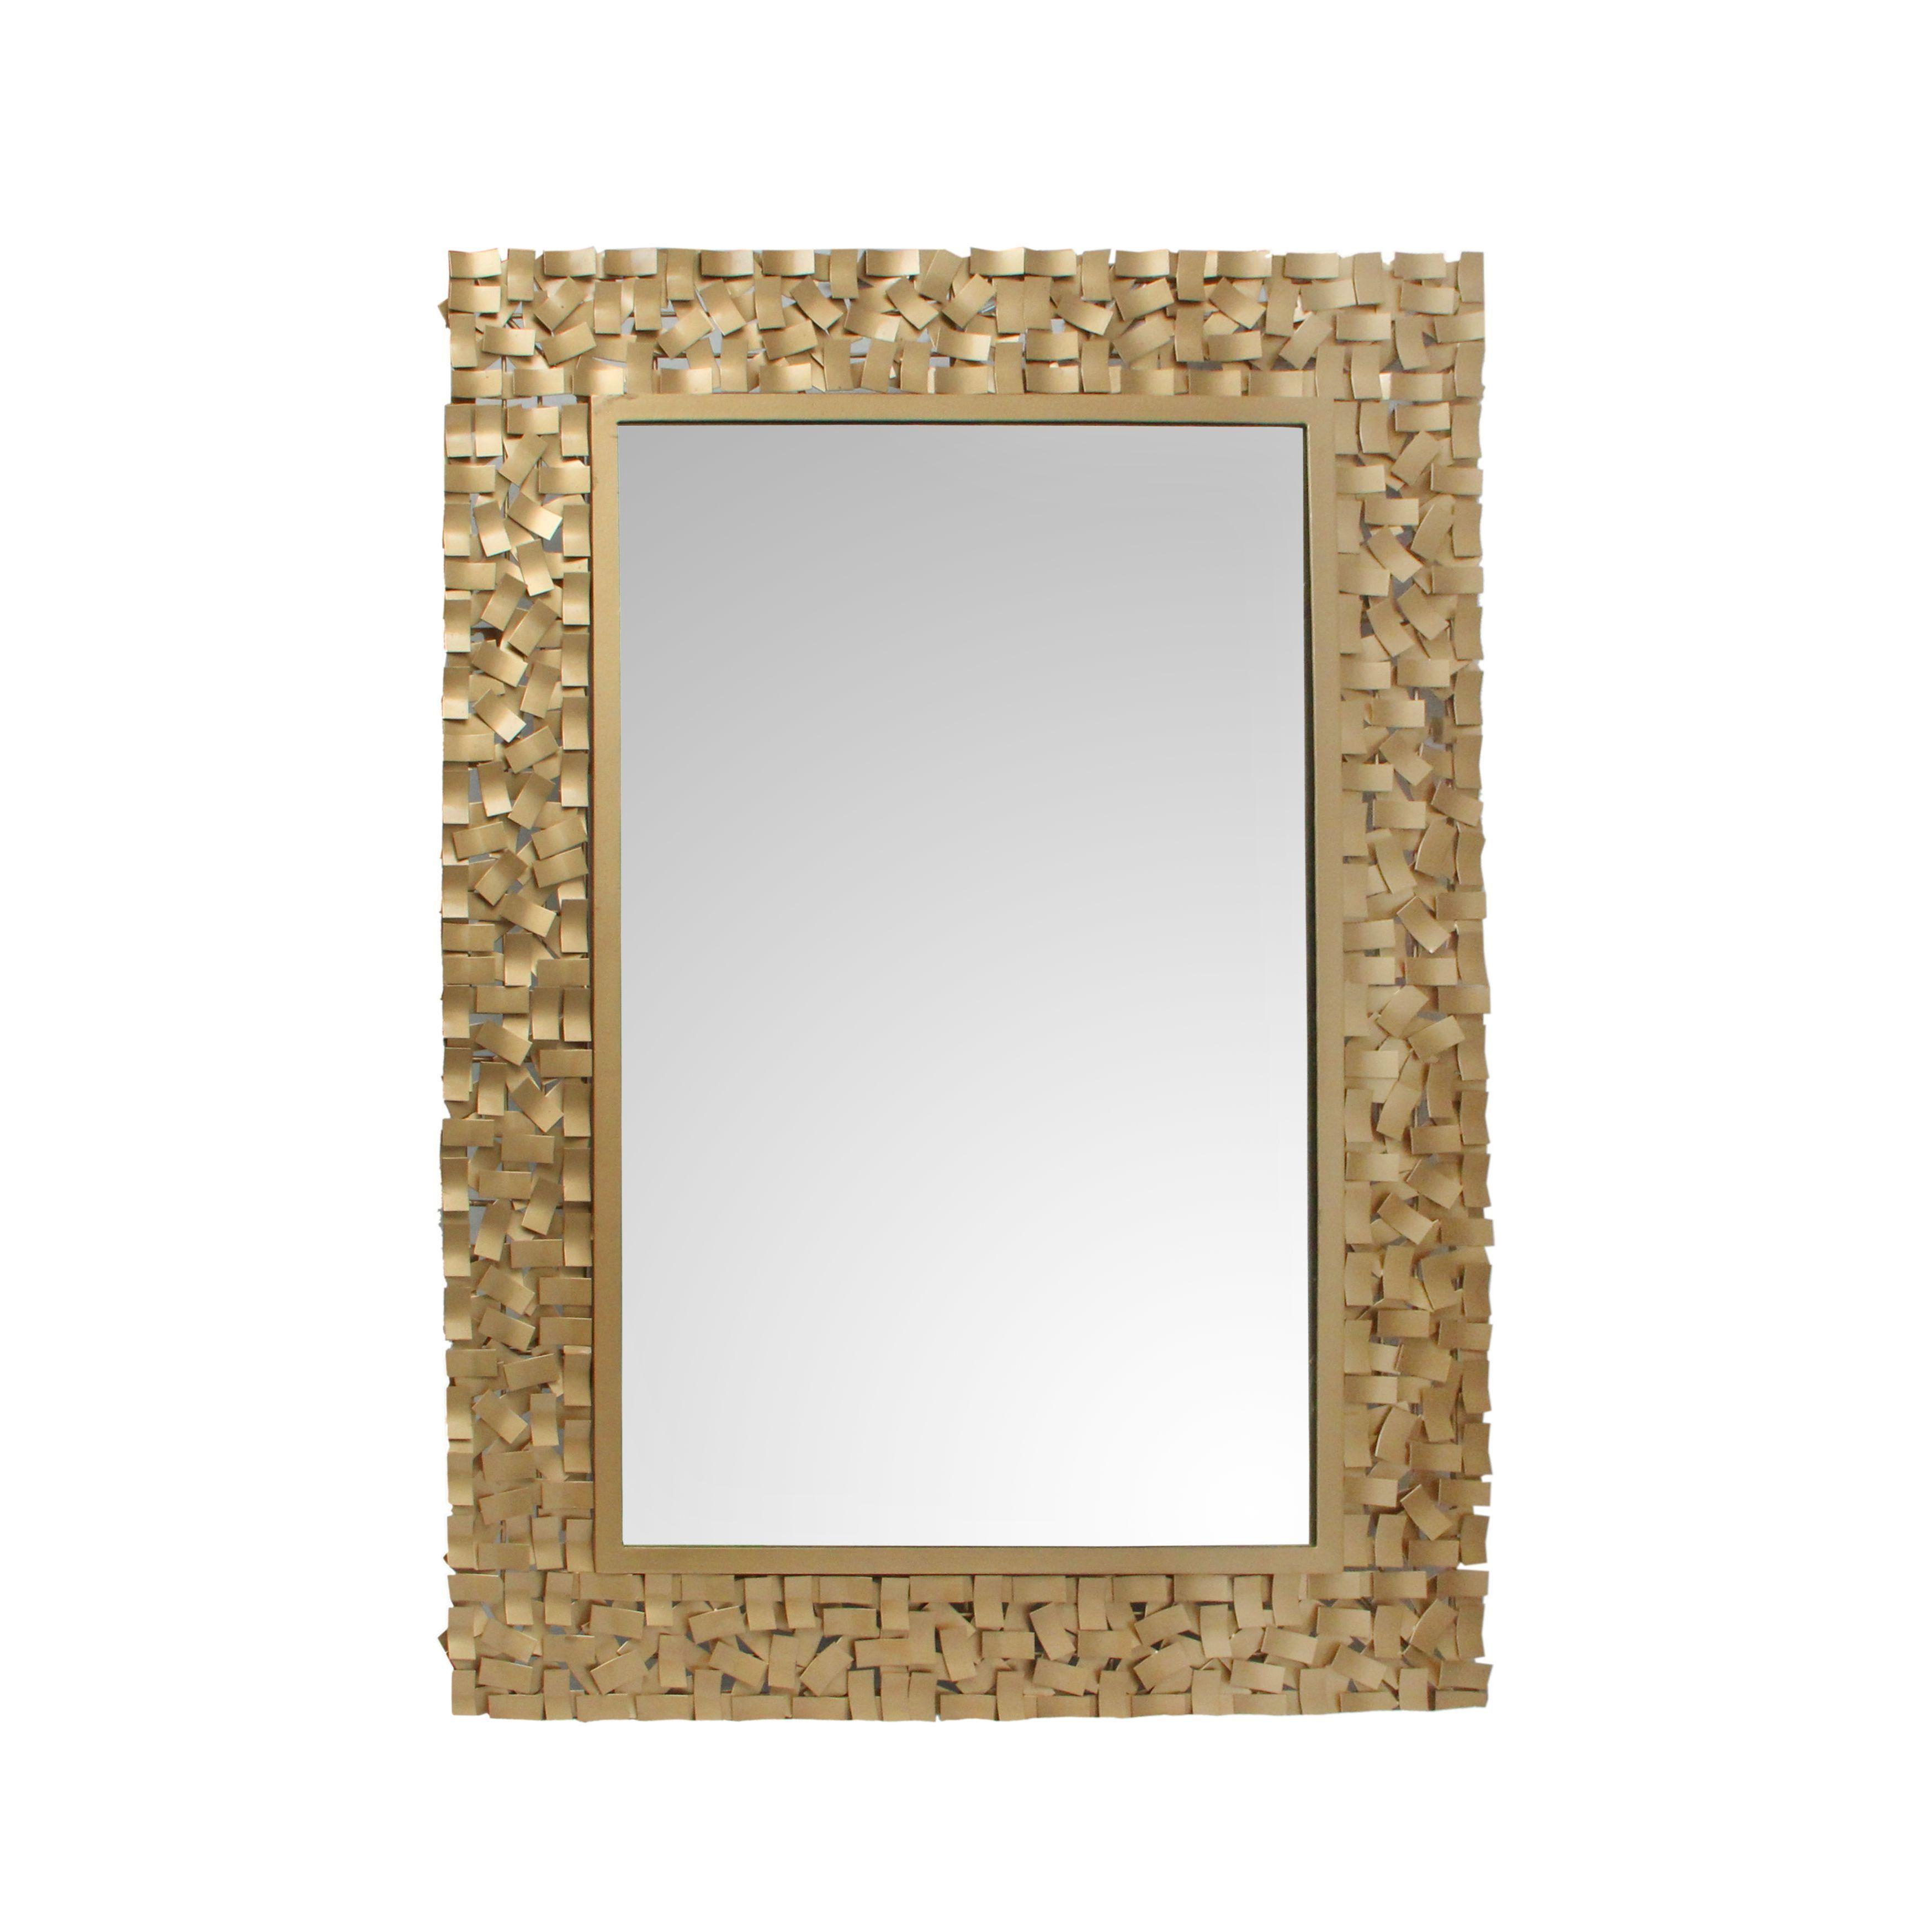 Aurelle home rectangular gold mirror rectangular gold mirror size